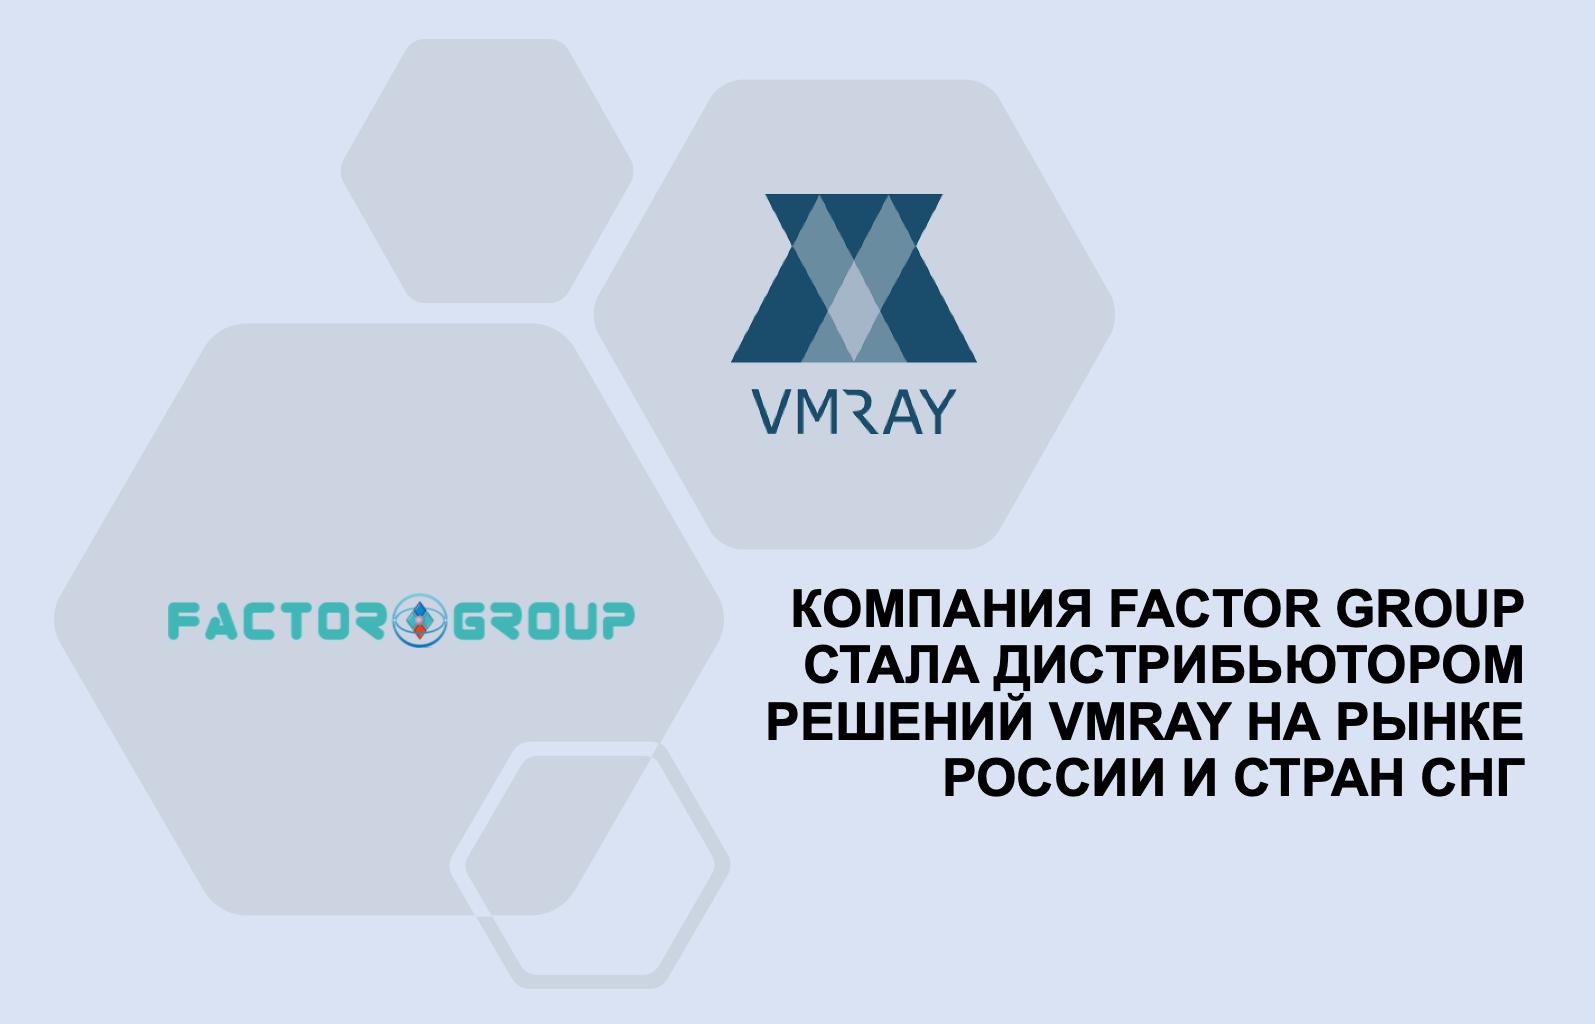 VMRay & Factor group